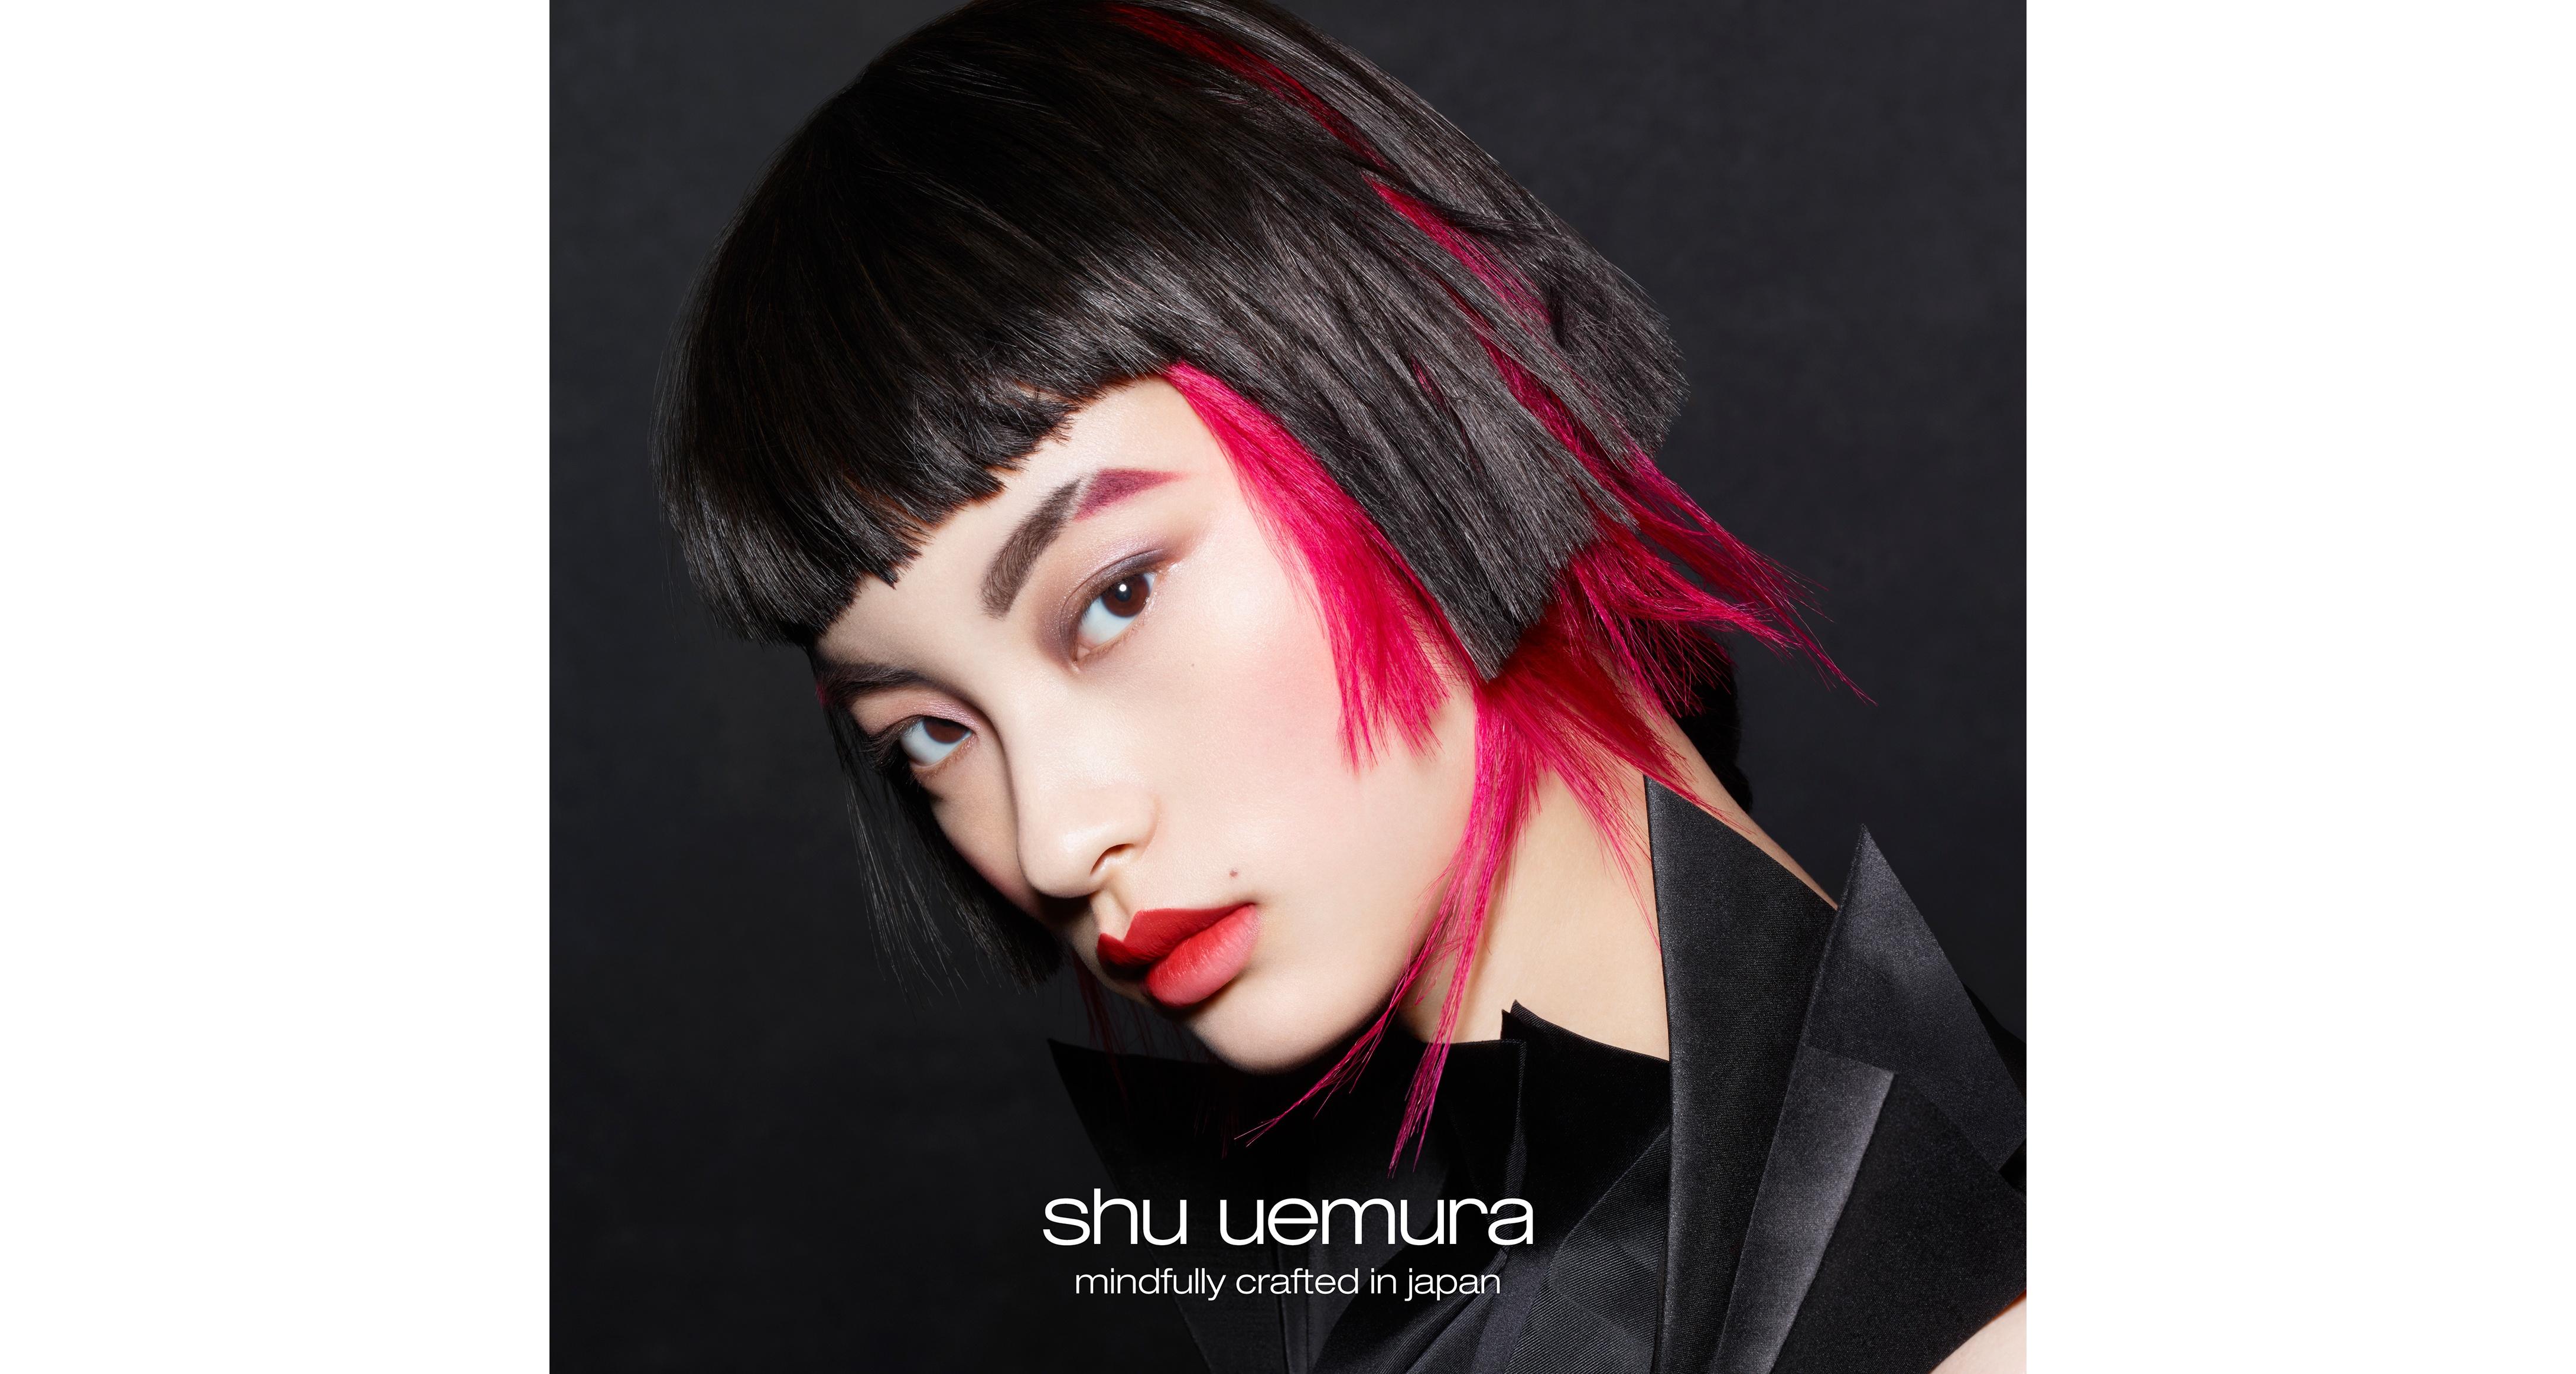 シュウ・ウエムラ shu uemura1